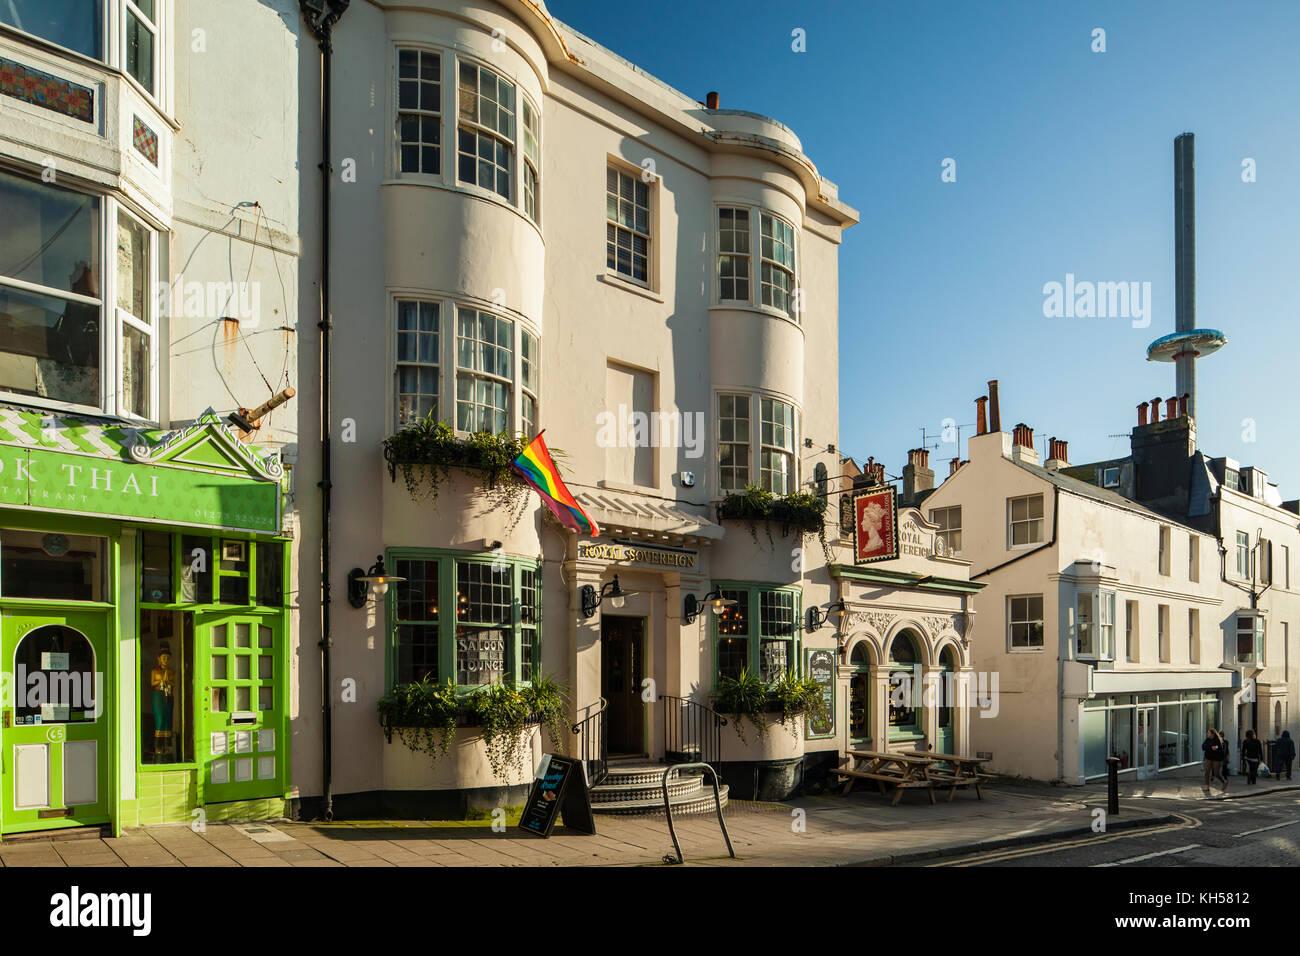 Brighton city centre, East Sussex, England. - Stock Image